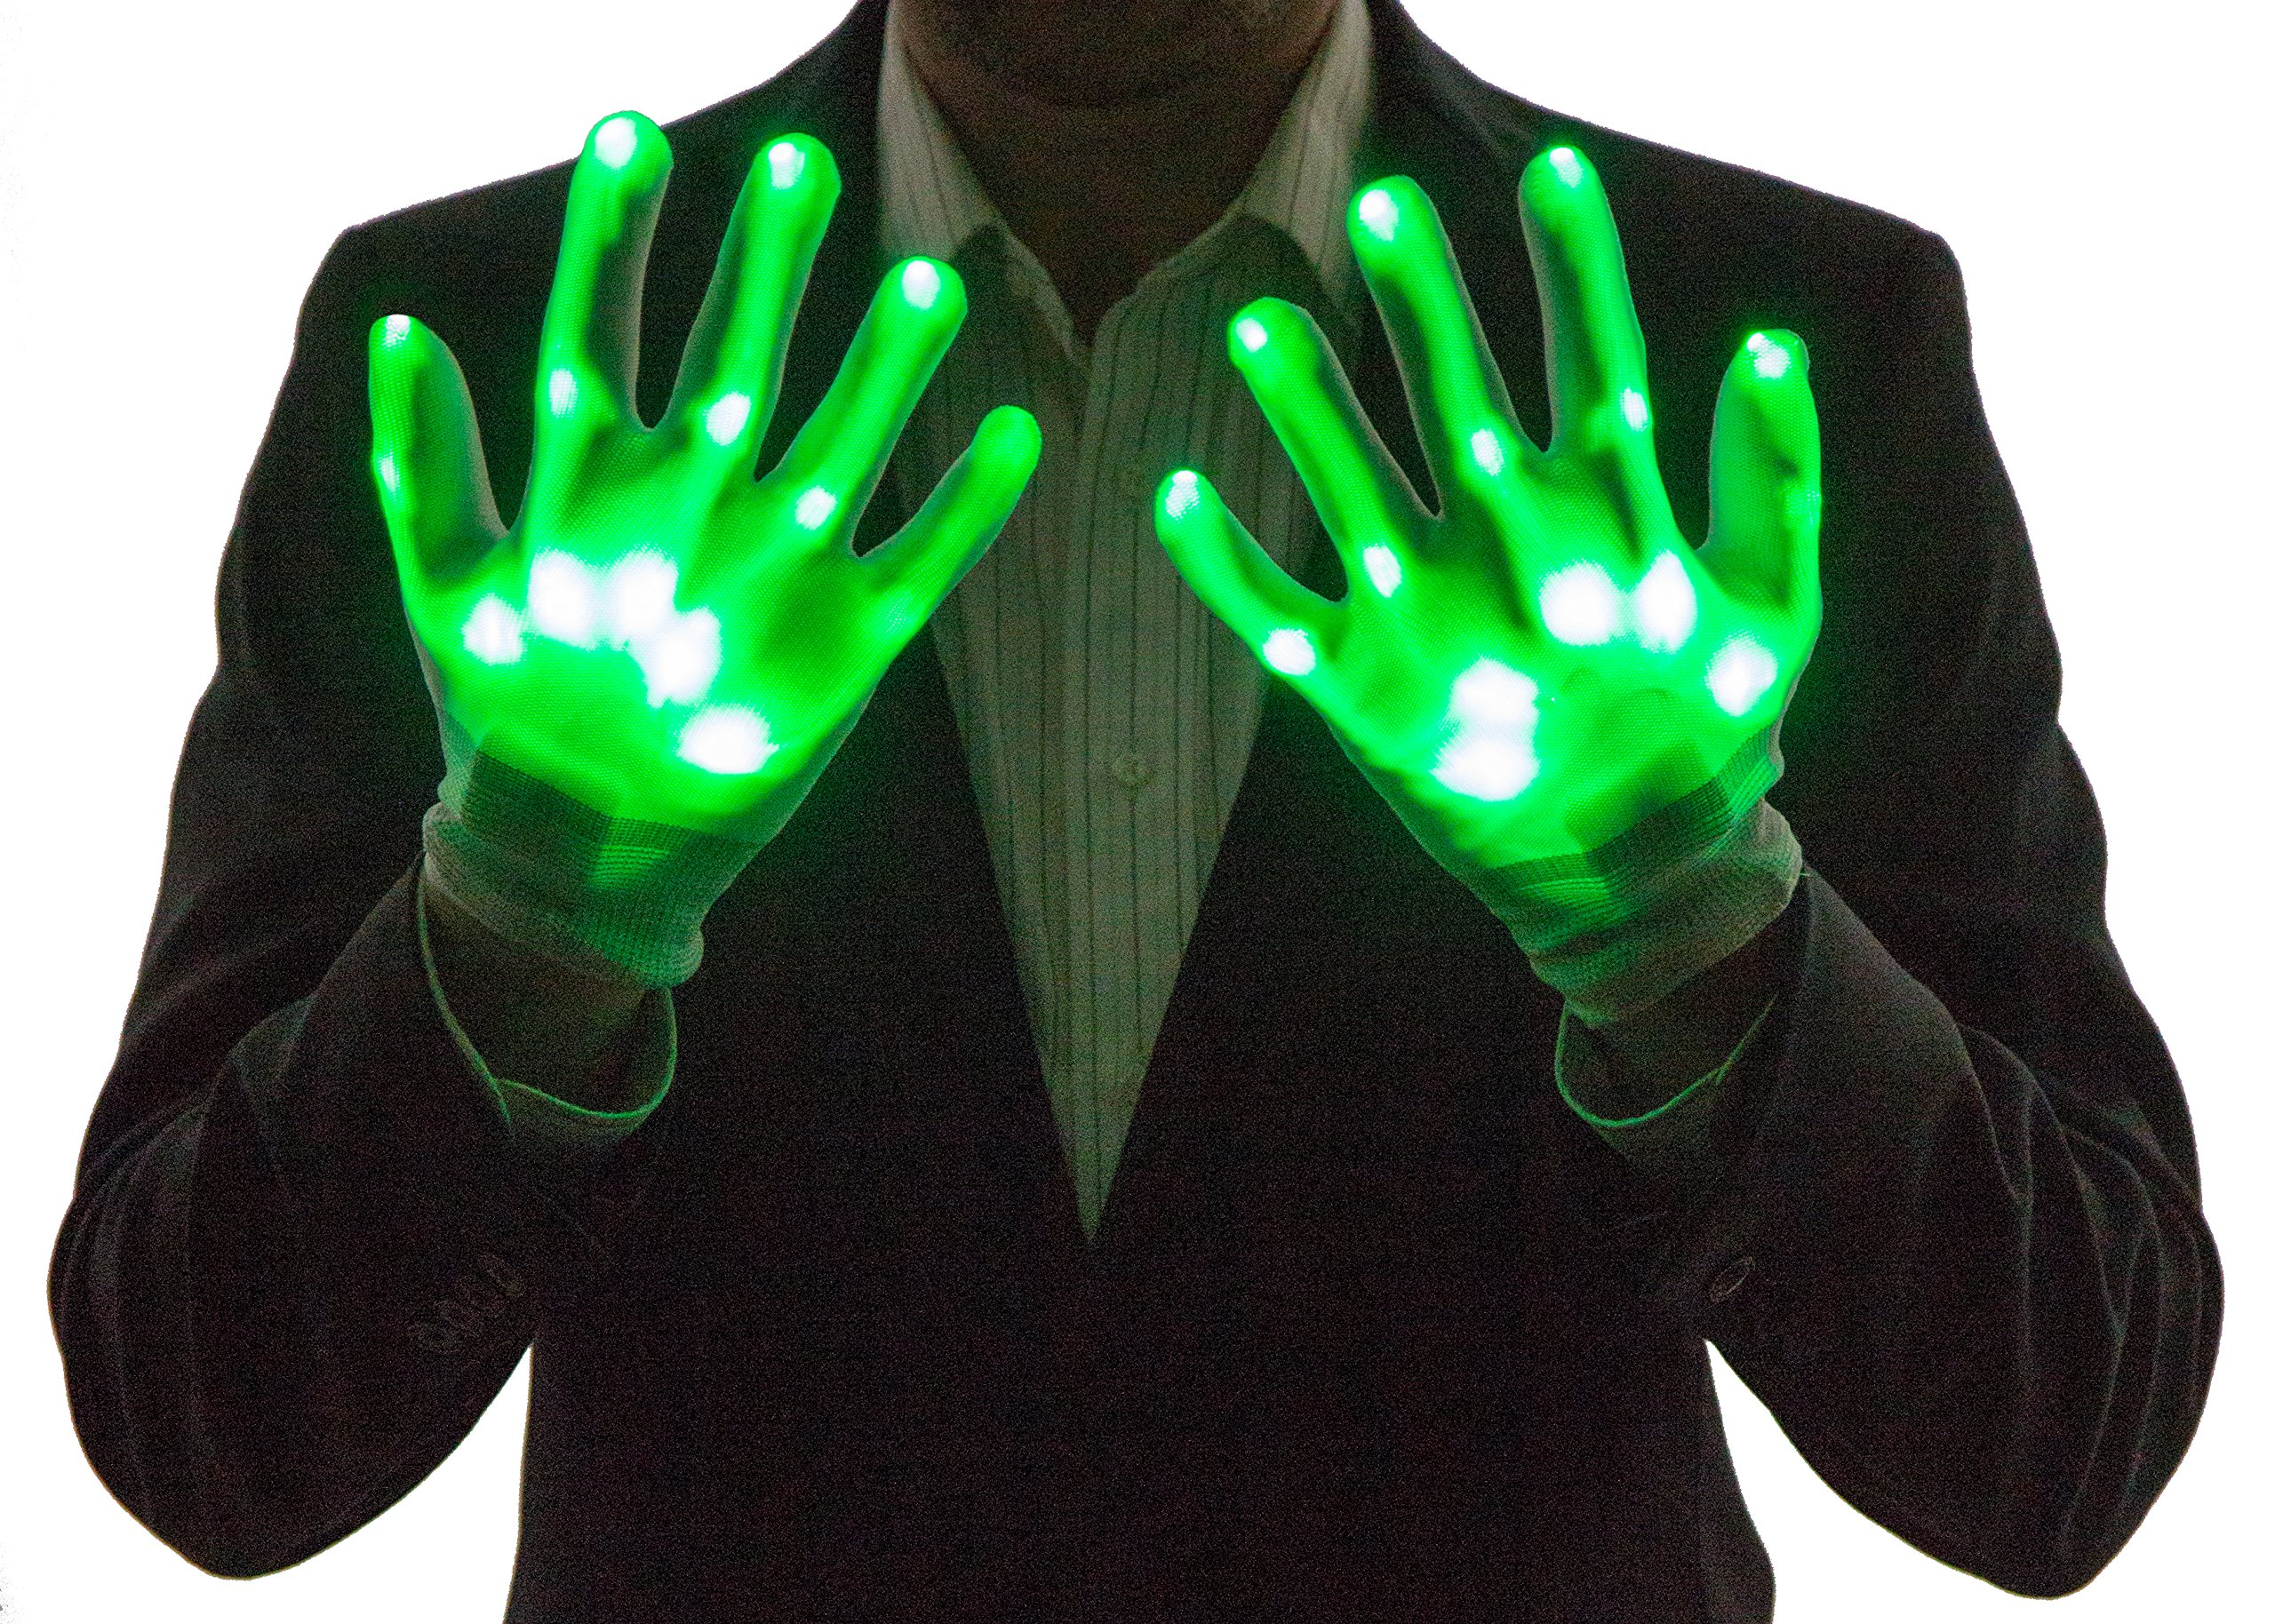 Neon Nightlife Light Up Gloves for Kids, LED, Green